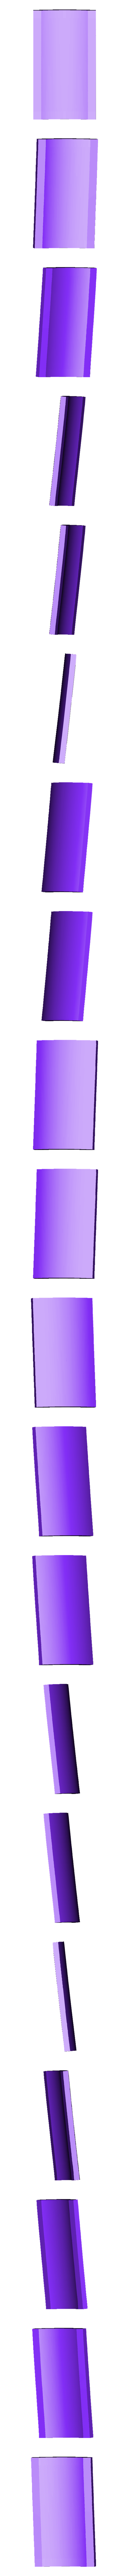 13 - NOSE LDG DOOR.stl Download STL file DOUGLAS F4D SKYRAY  • 3D printer object, 3DprintedArmy